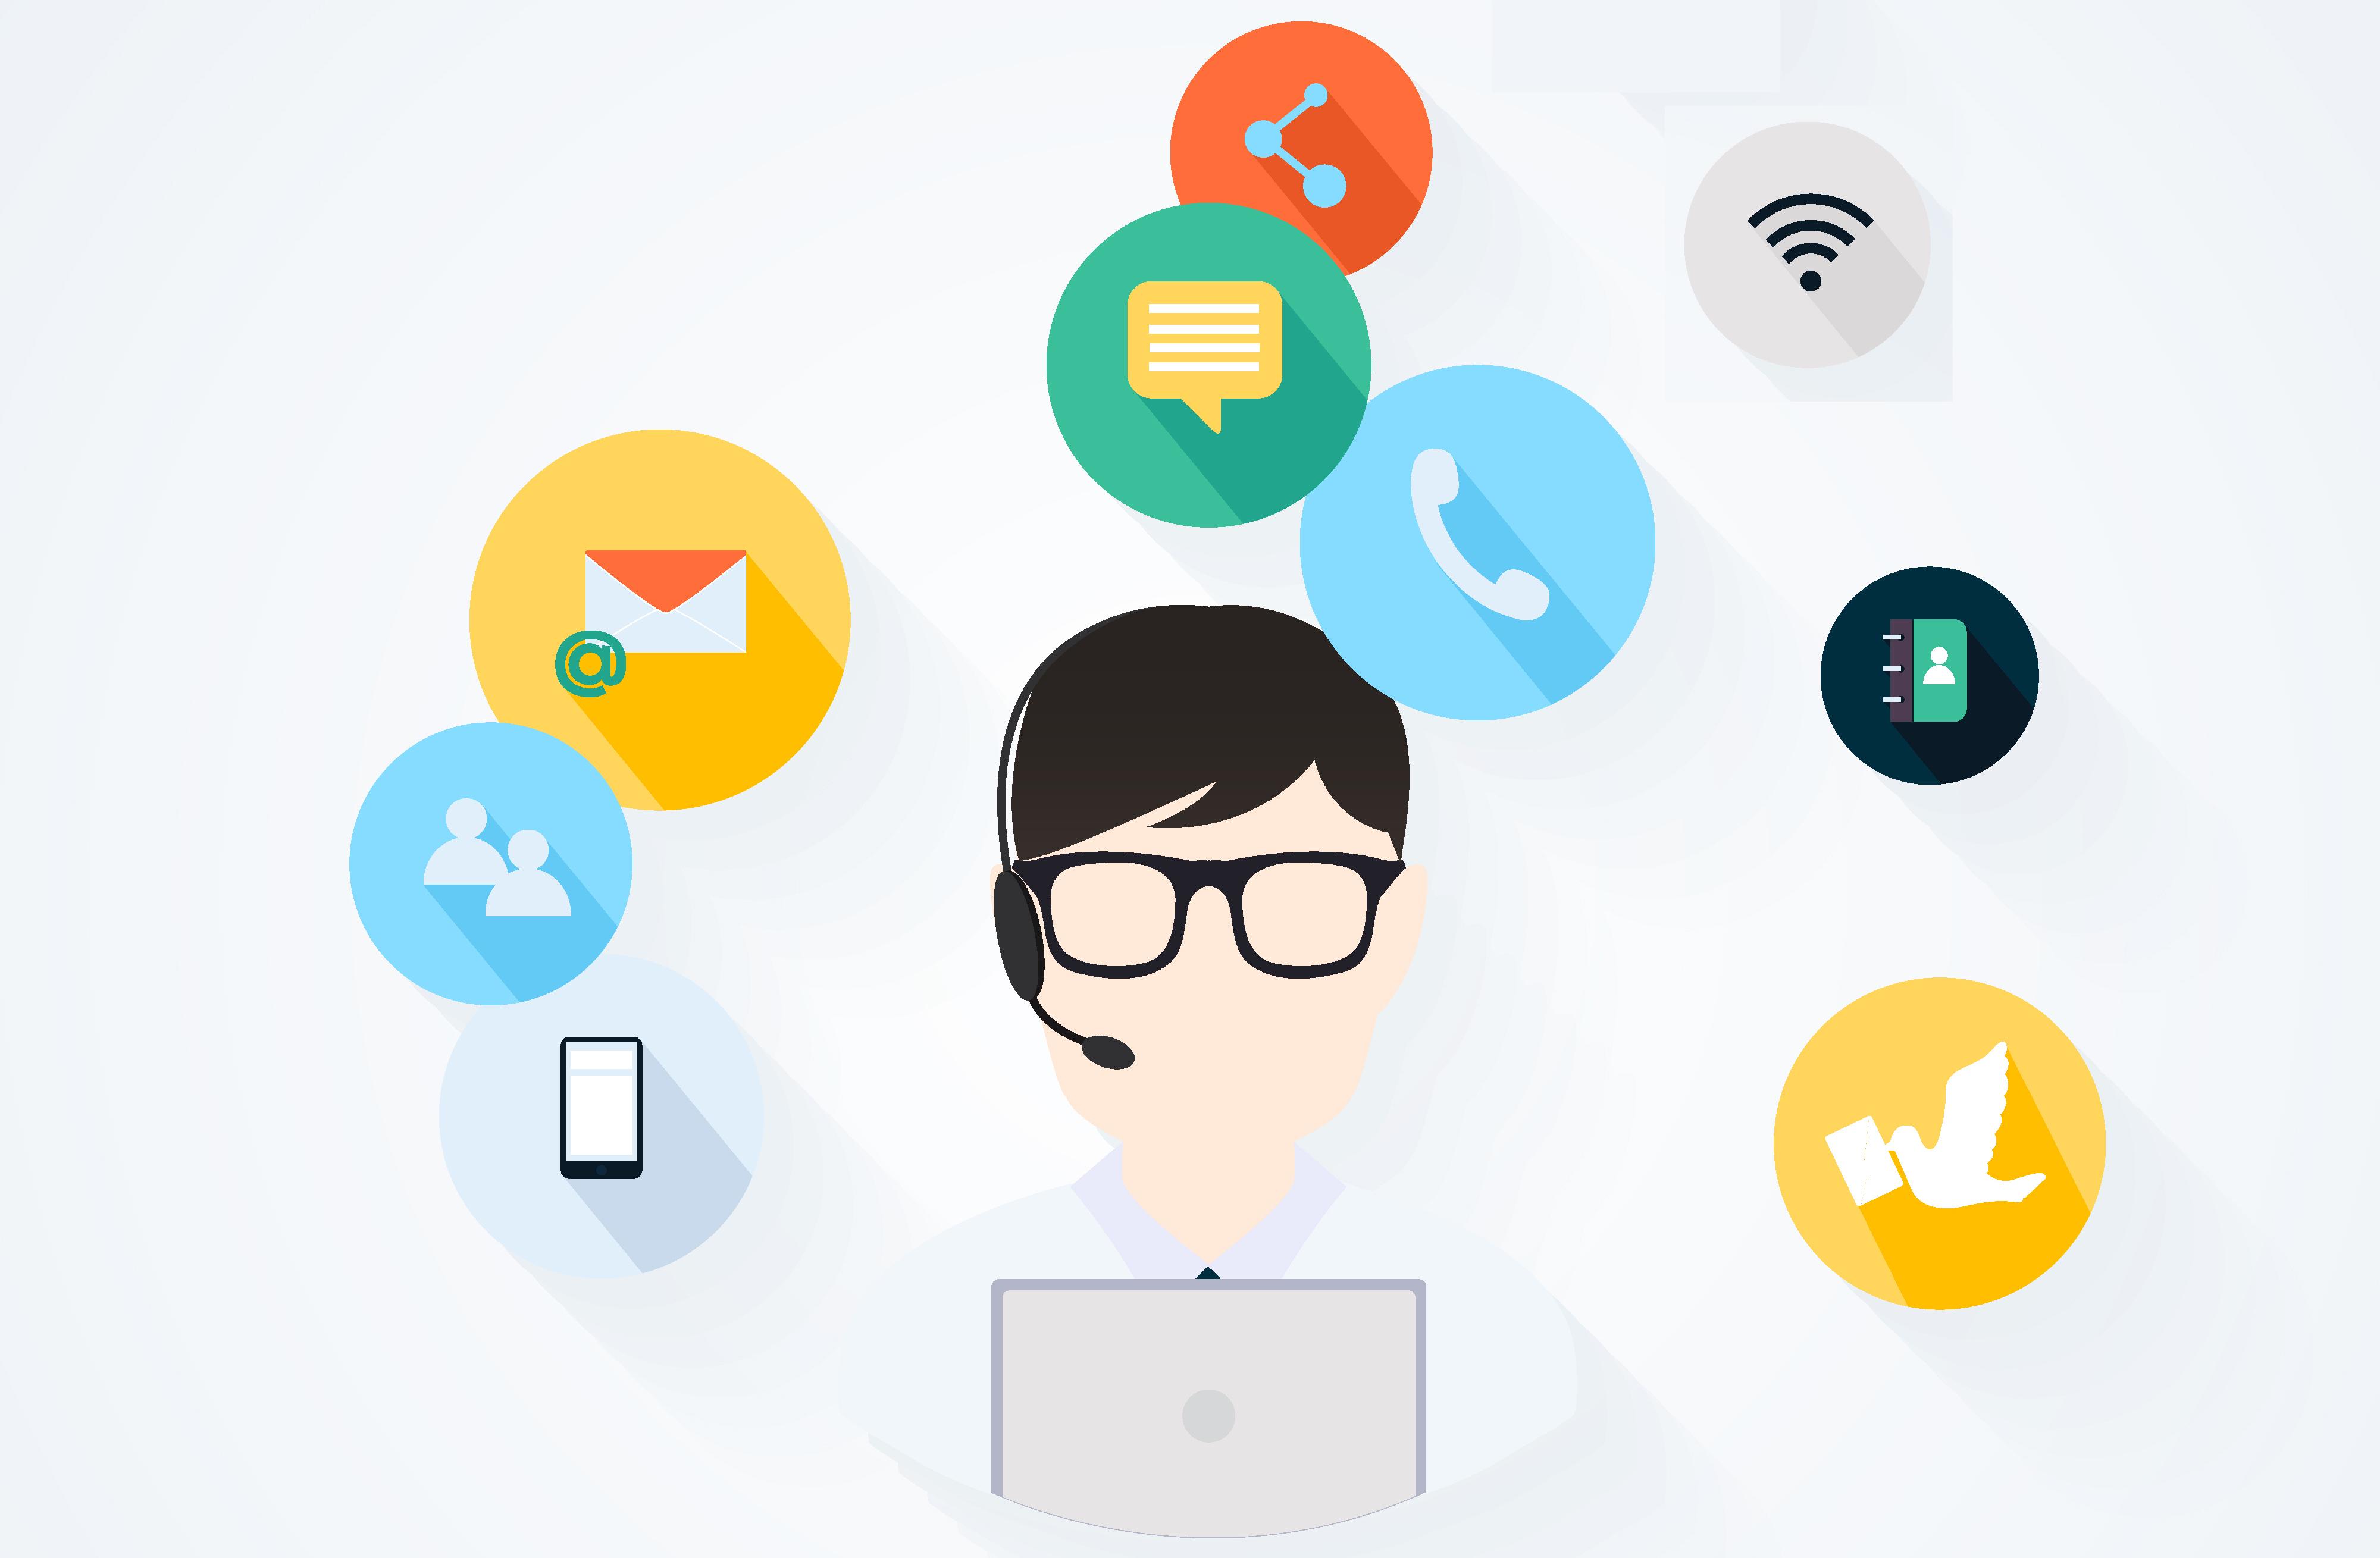 Hubungi dukungan pelanggan GoDaddy | Manajemen Akun - Bantuan GoDaddy ID